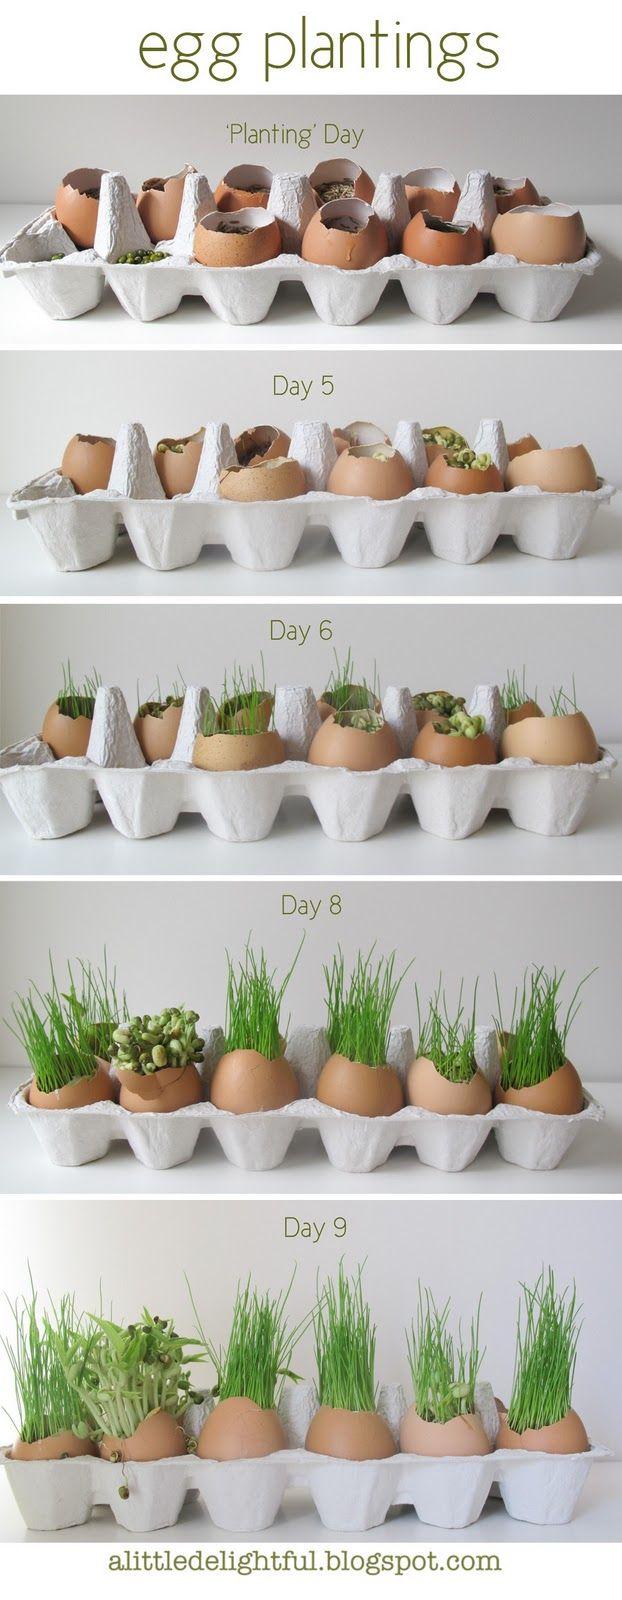 Plantation d'œufs